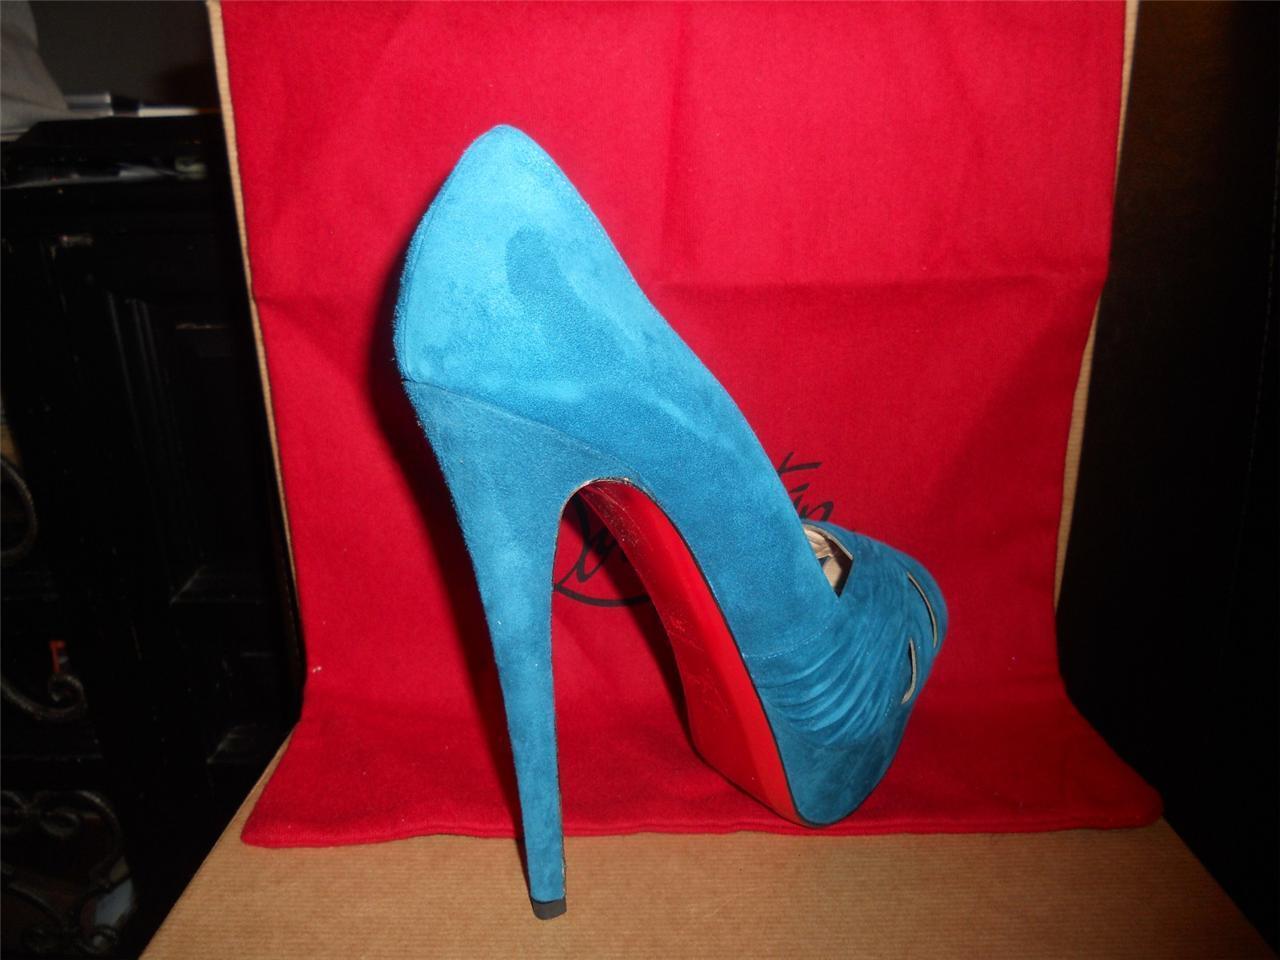 Christian Louboutin ABORINA Suede Suede Suede Twist Front Platform Heels Pumps chaussures 9ff7b7